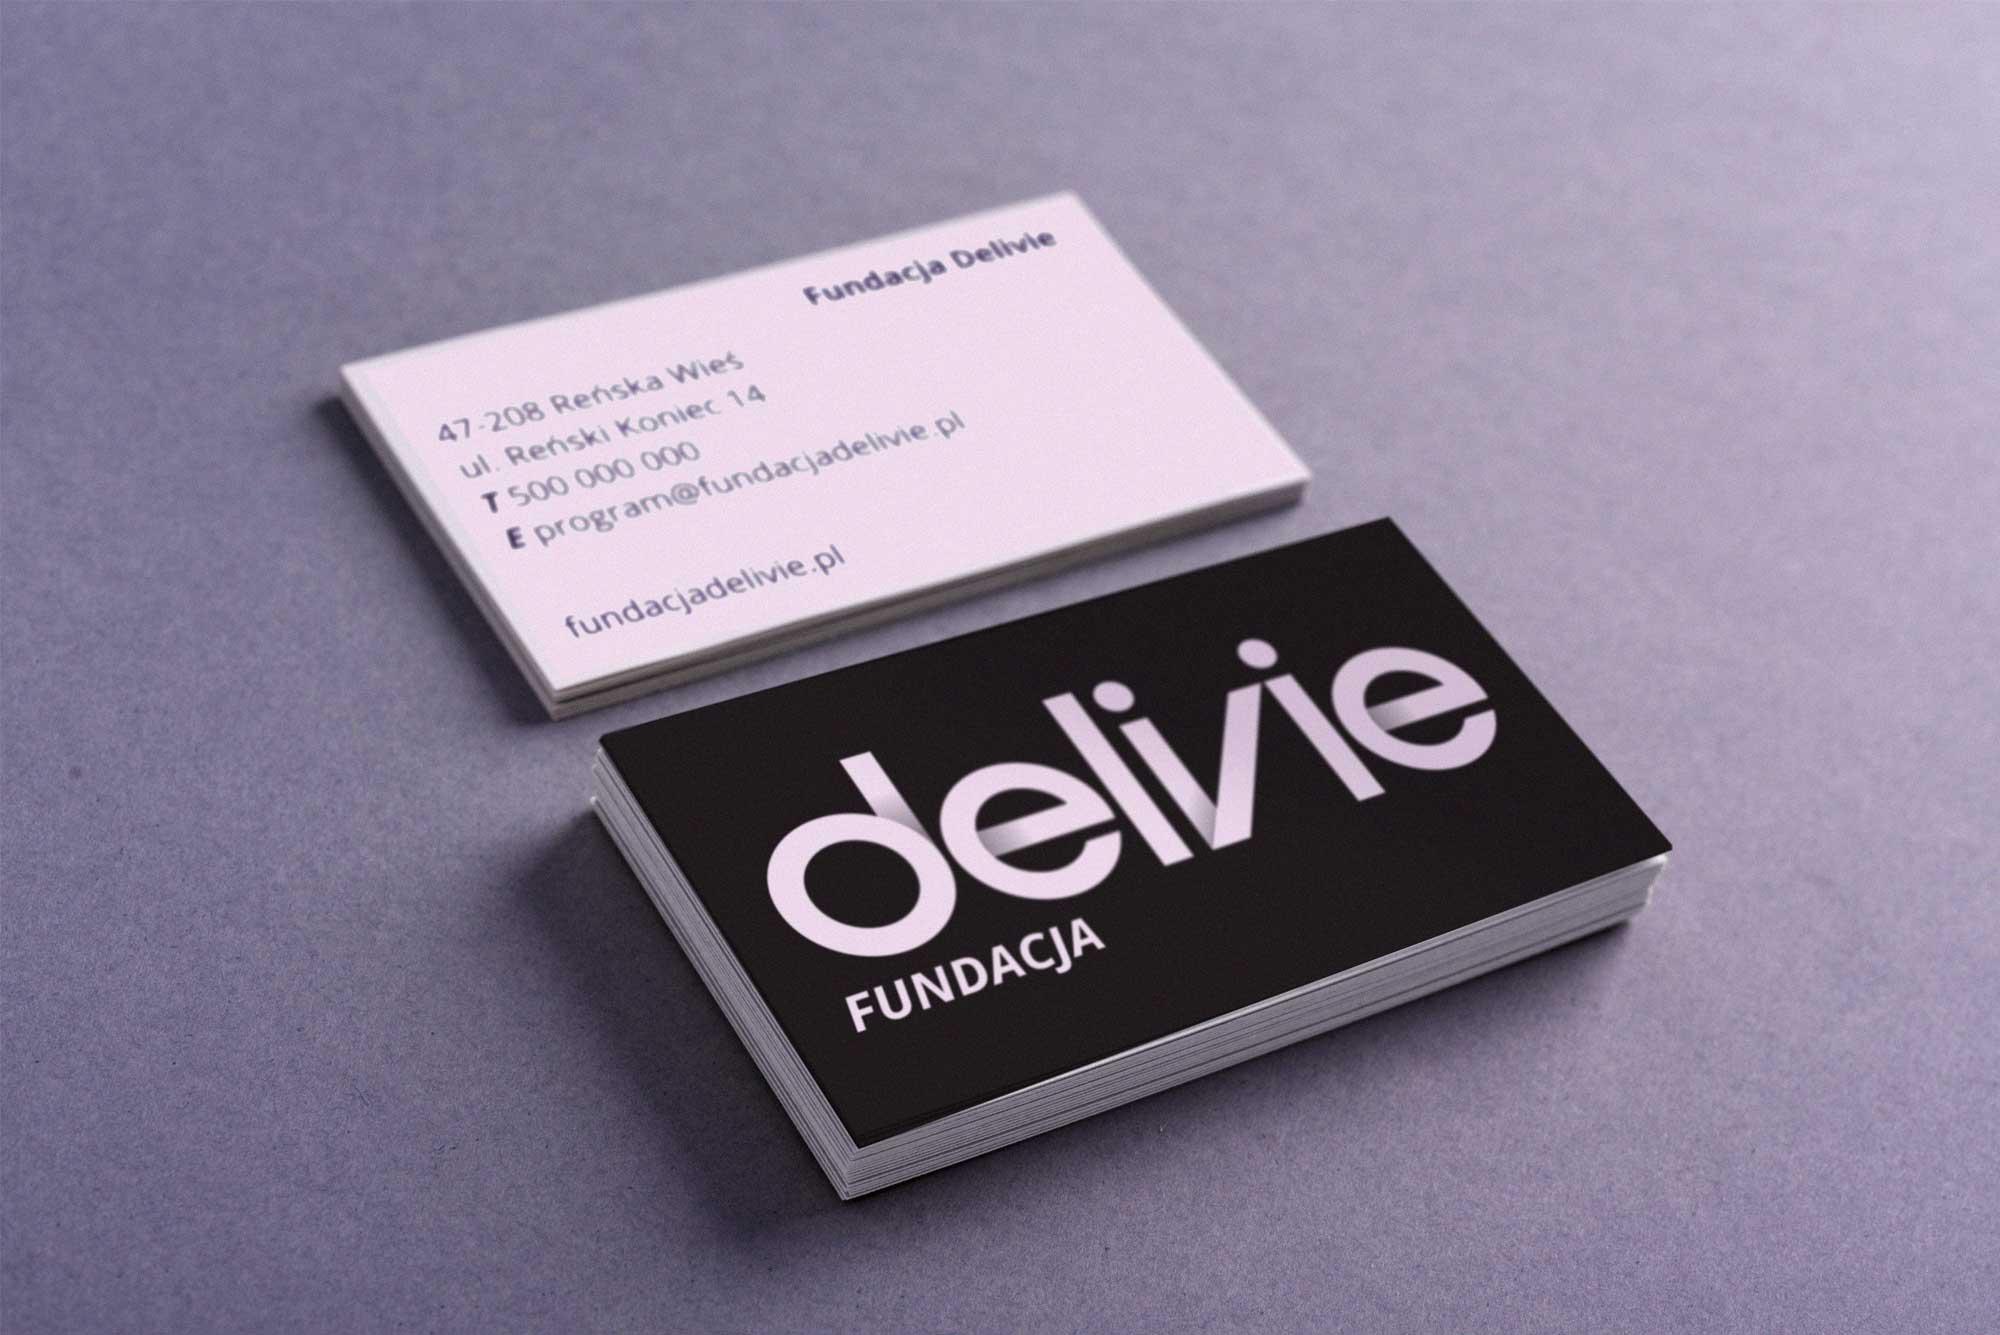 Delivie_2000px_010